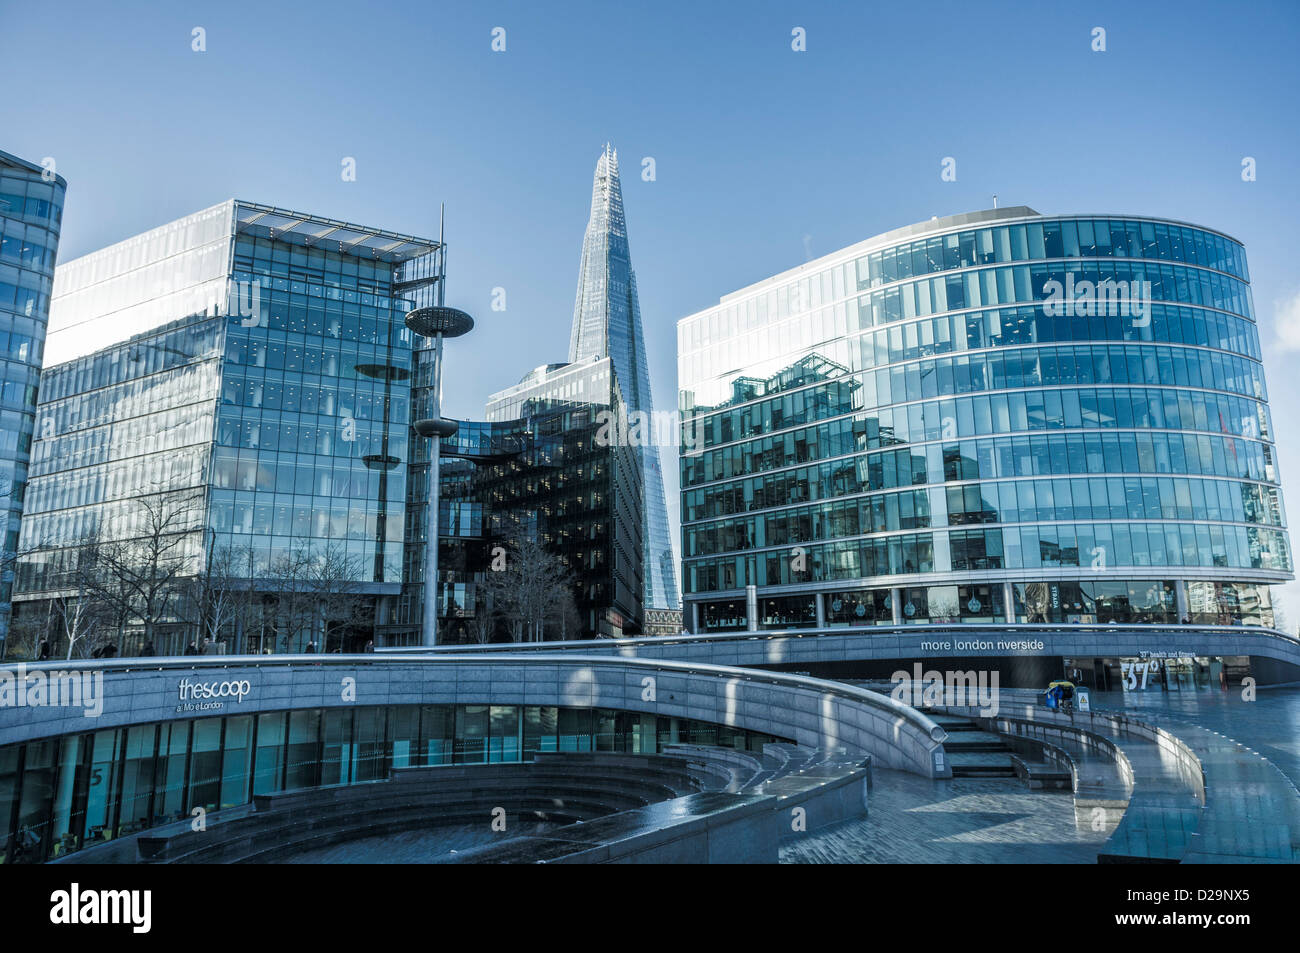 The Scoop at the More London Riverside development, London, UK - Stock Image